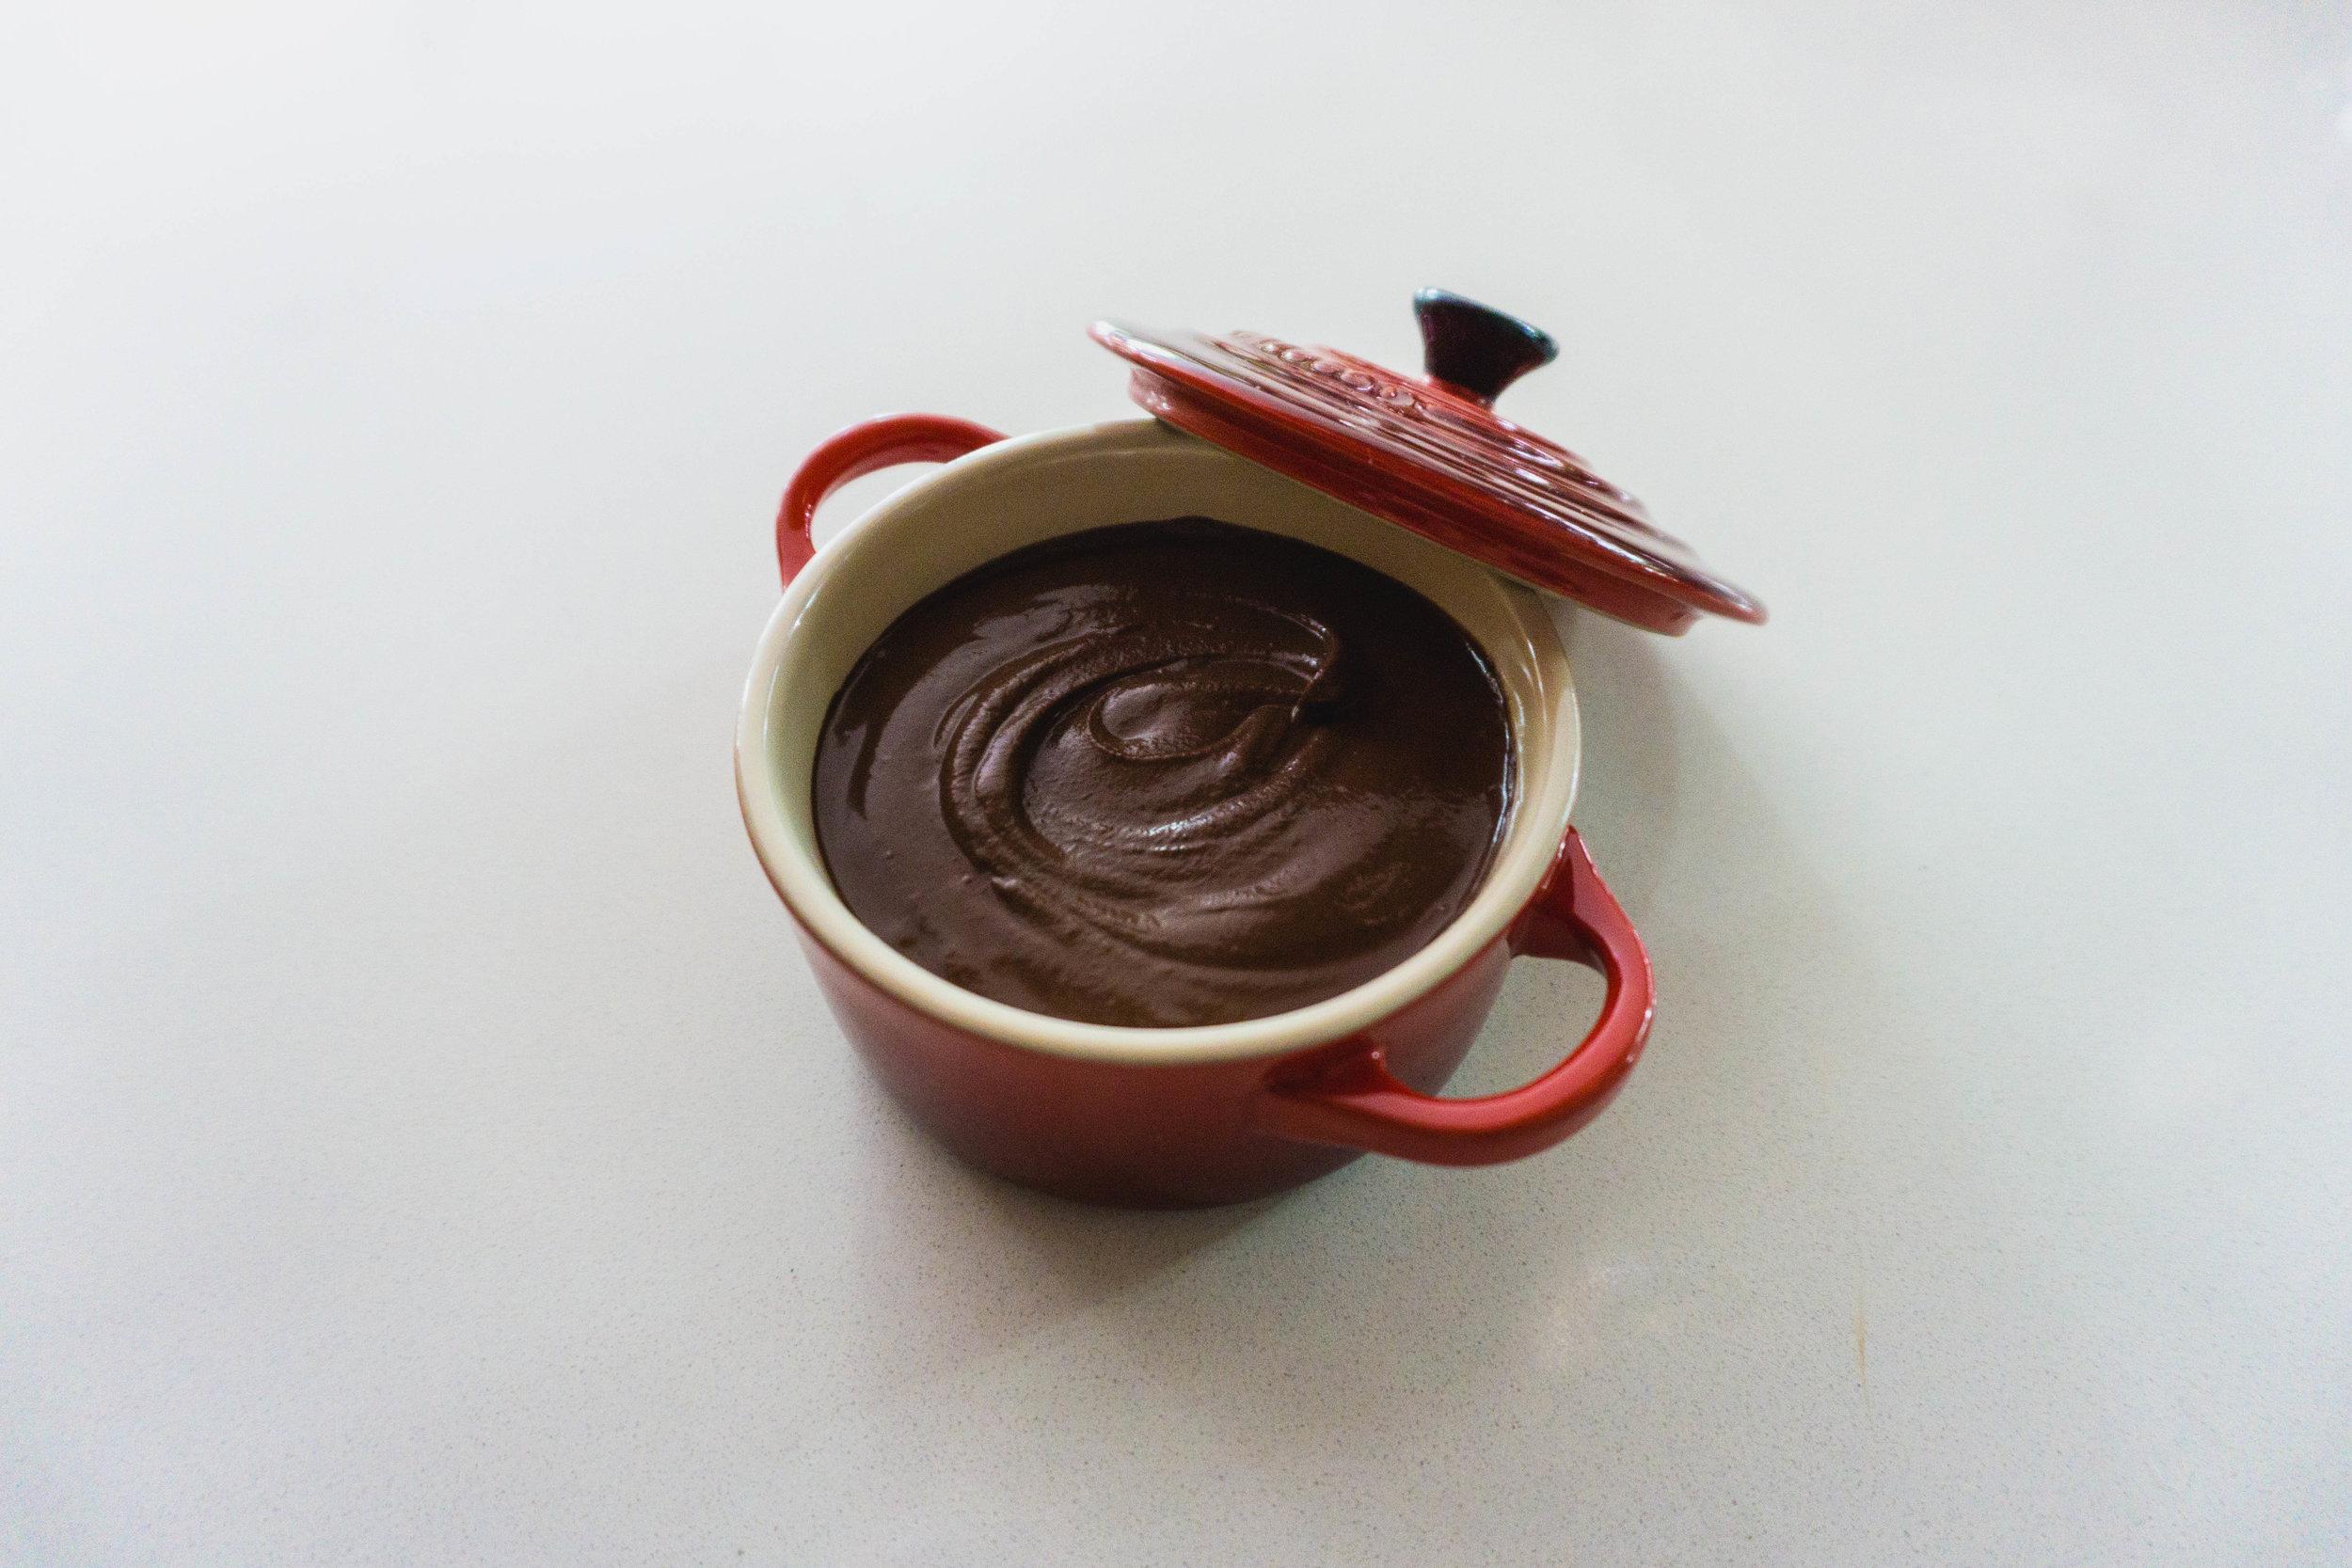 Chocolate Mousse in Le Creuset Pot :P